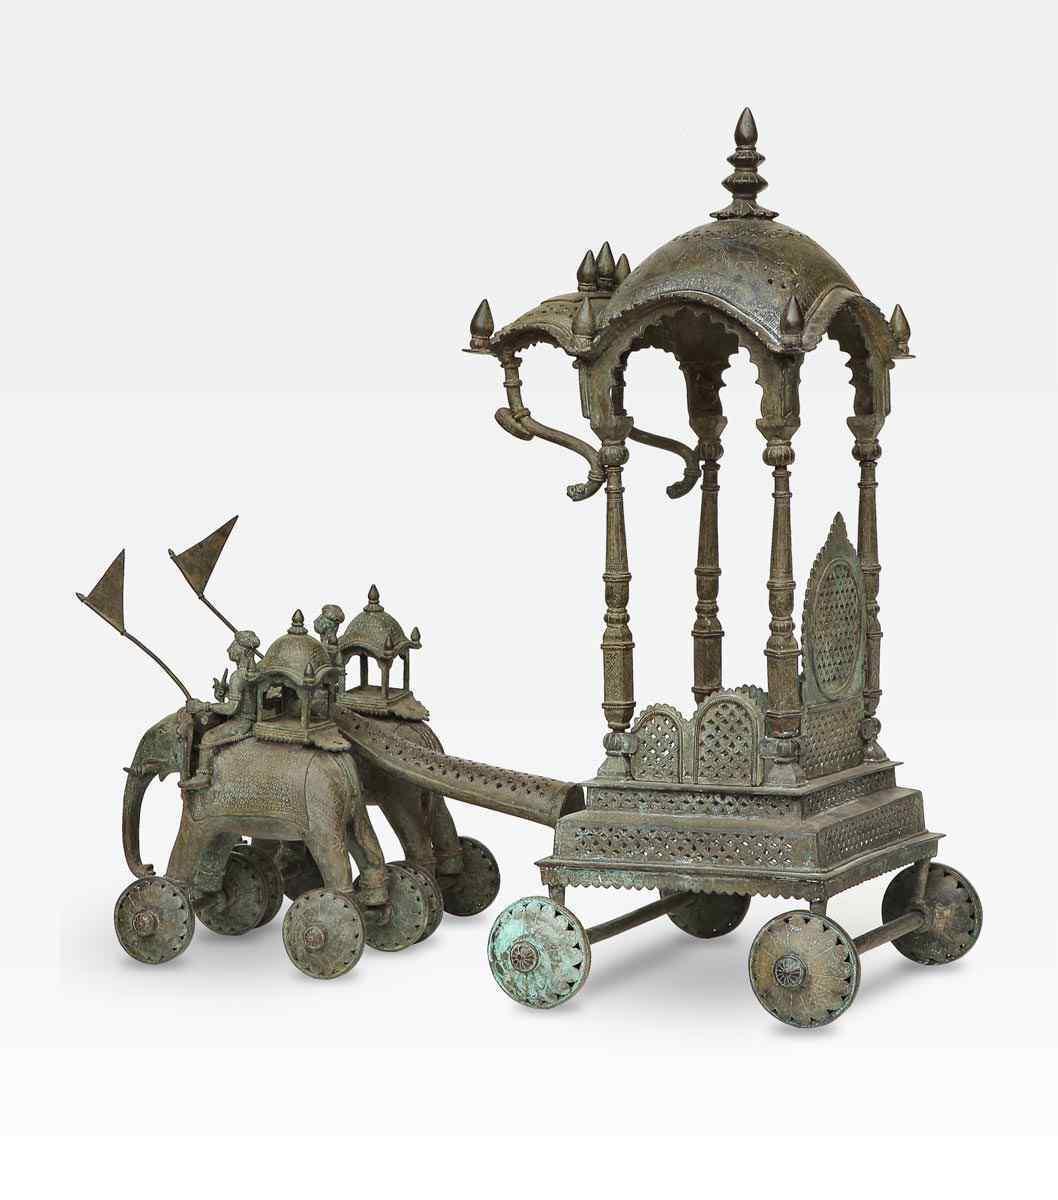 Scultura bronzo, fusione cera persa, periodo Mughal